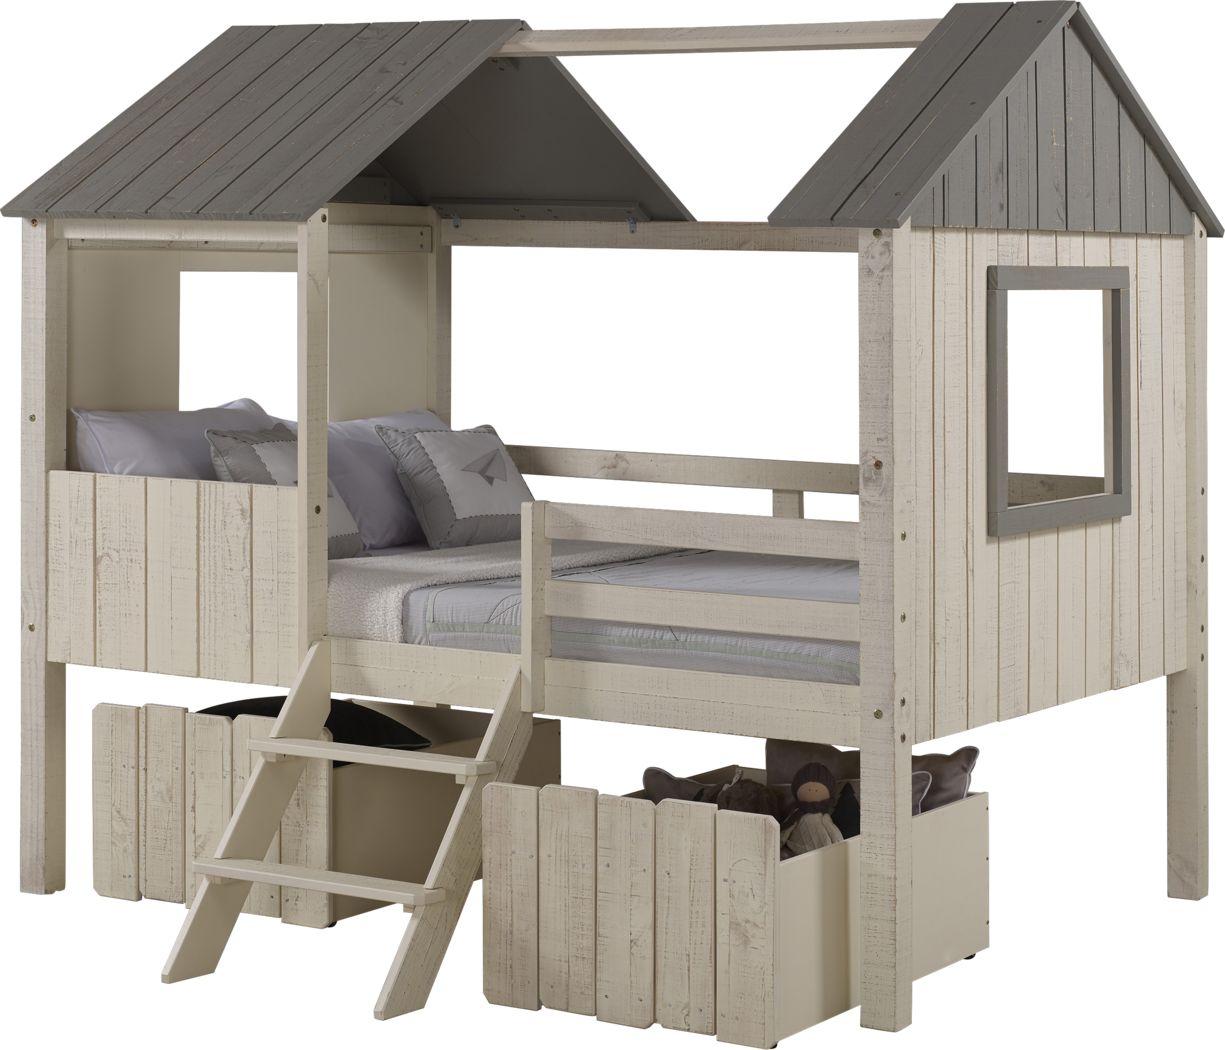 Bungalow Dreams Beige Full Jr. Loft Bed with 2 Beige Storage Drawers